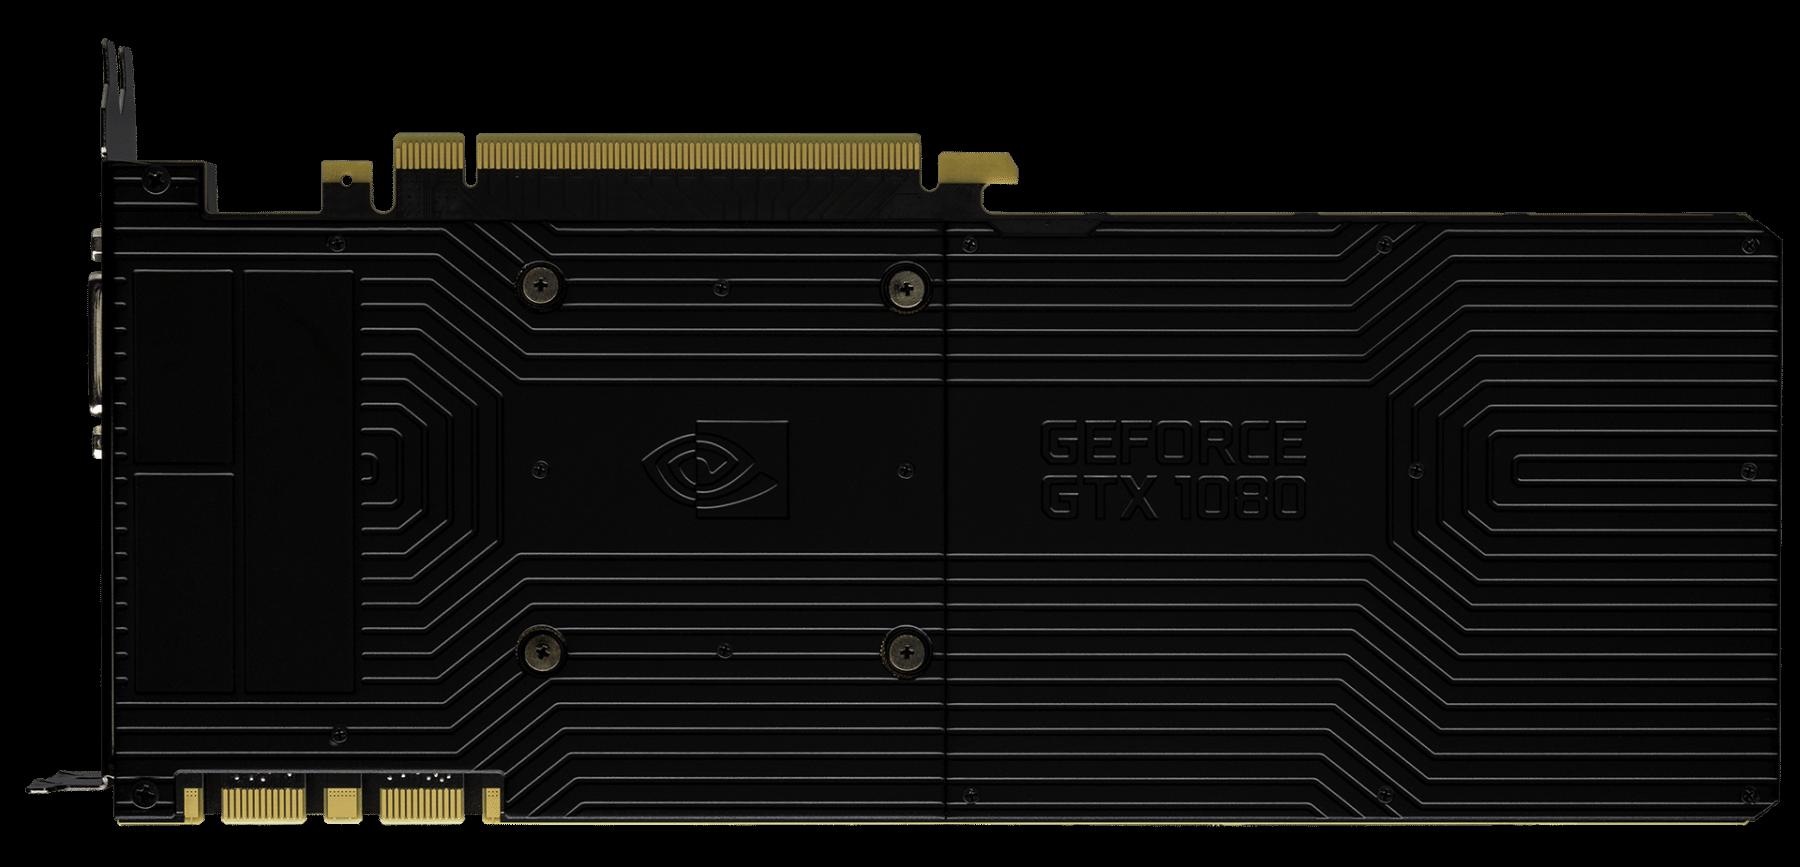 nvidia-geforce-gtx-1080-Back